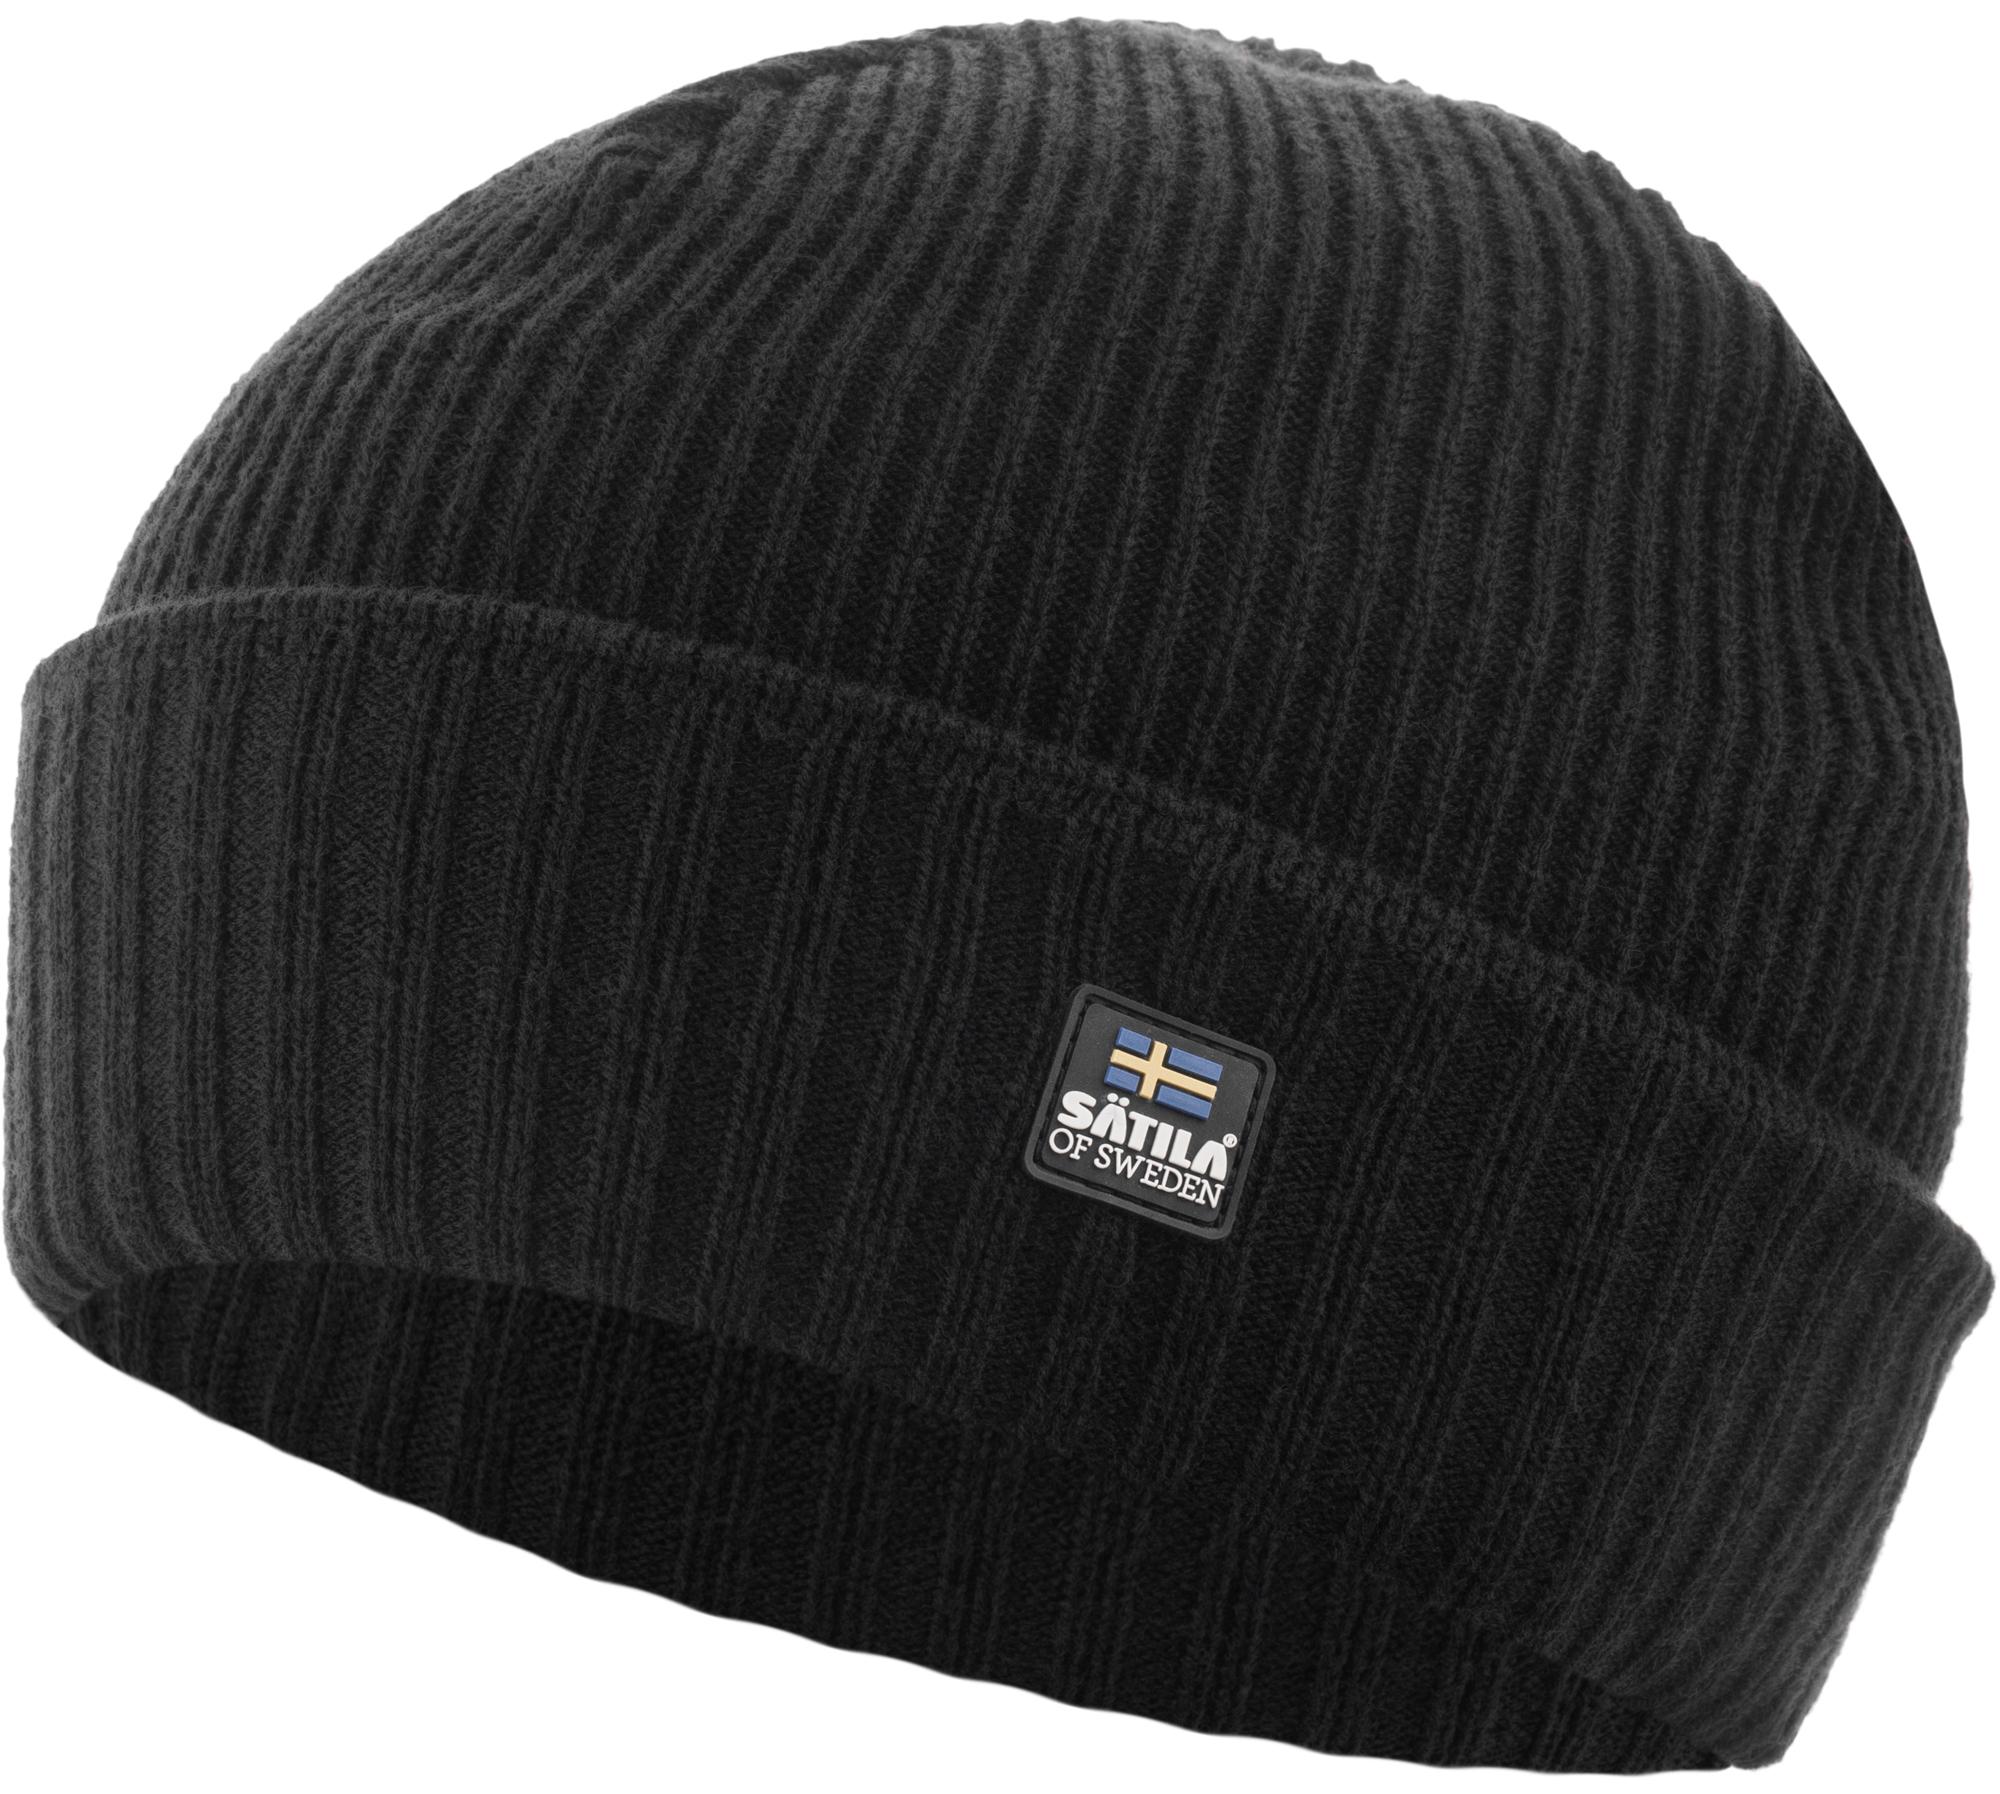 Satila Шапка Satila Forsmo, размер 58 satila шапка satila reflect размер 58